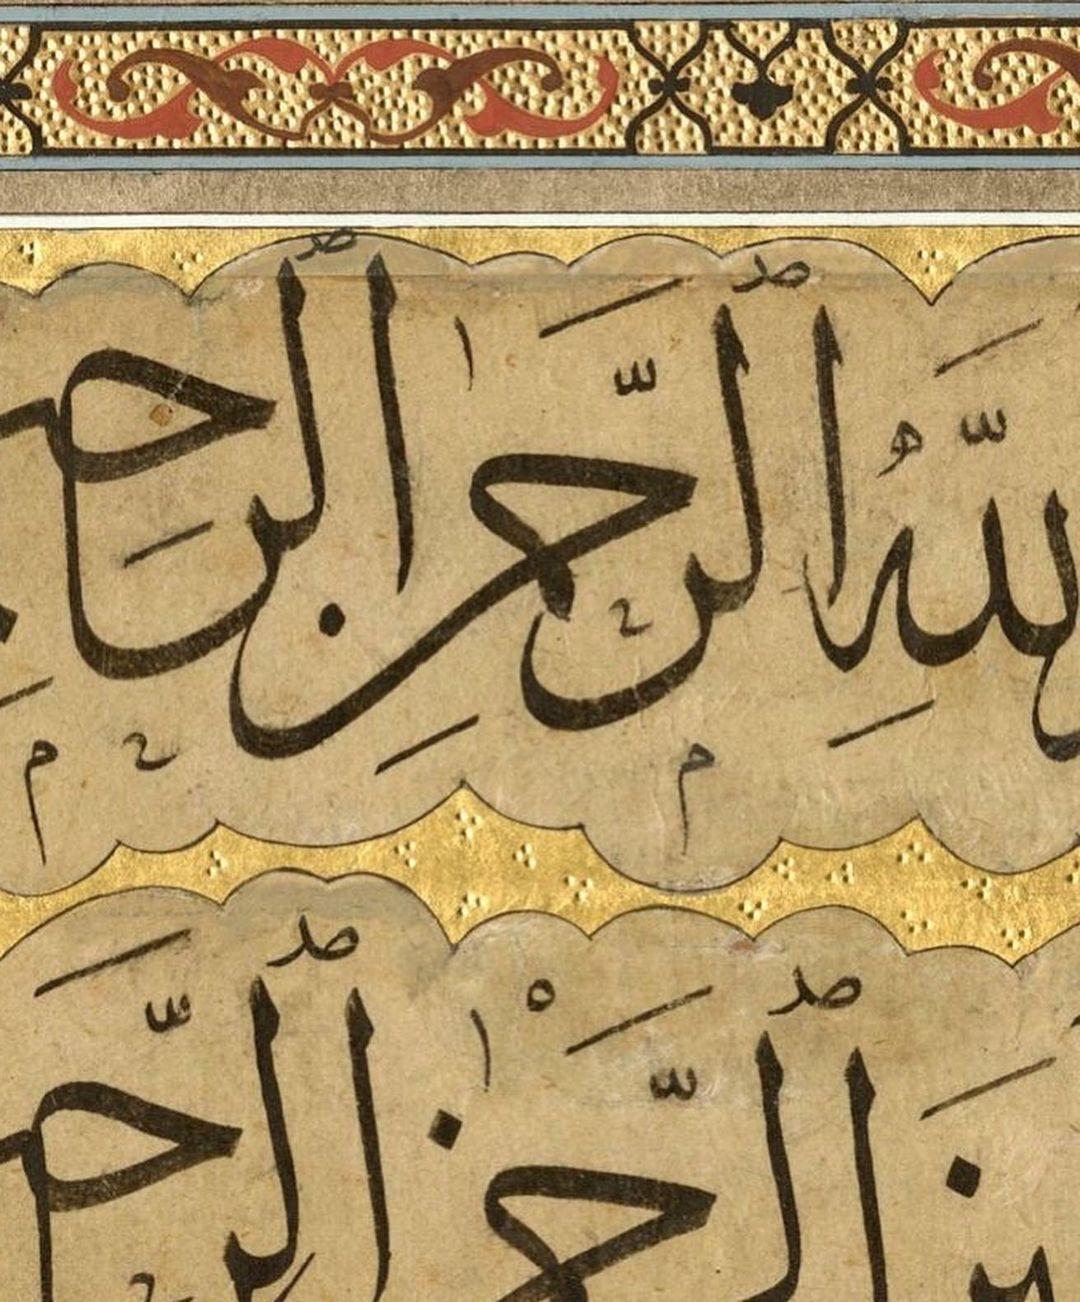 Apk Website For Arabic Calligraphy بِسْمِ اللّٰهِ الرَّحْمٰنِ الرَّح۪يمِ اَلْحَمْدُ لِلّٰهِ رَبِّ الْـعَالَم۪ينَۙ ا... 1441 2